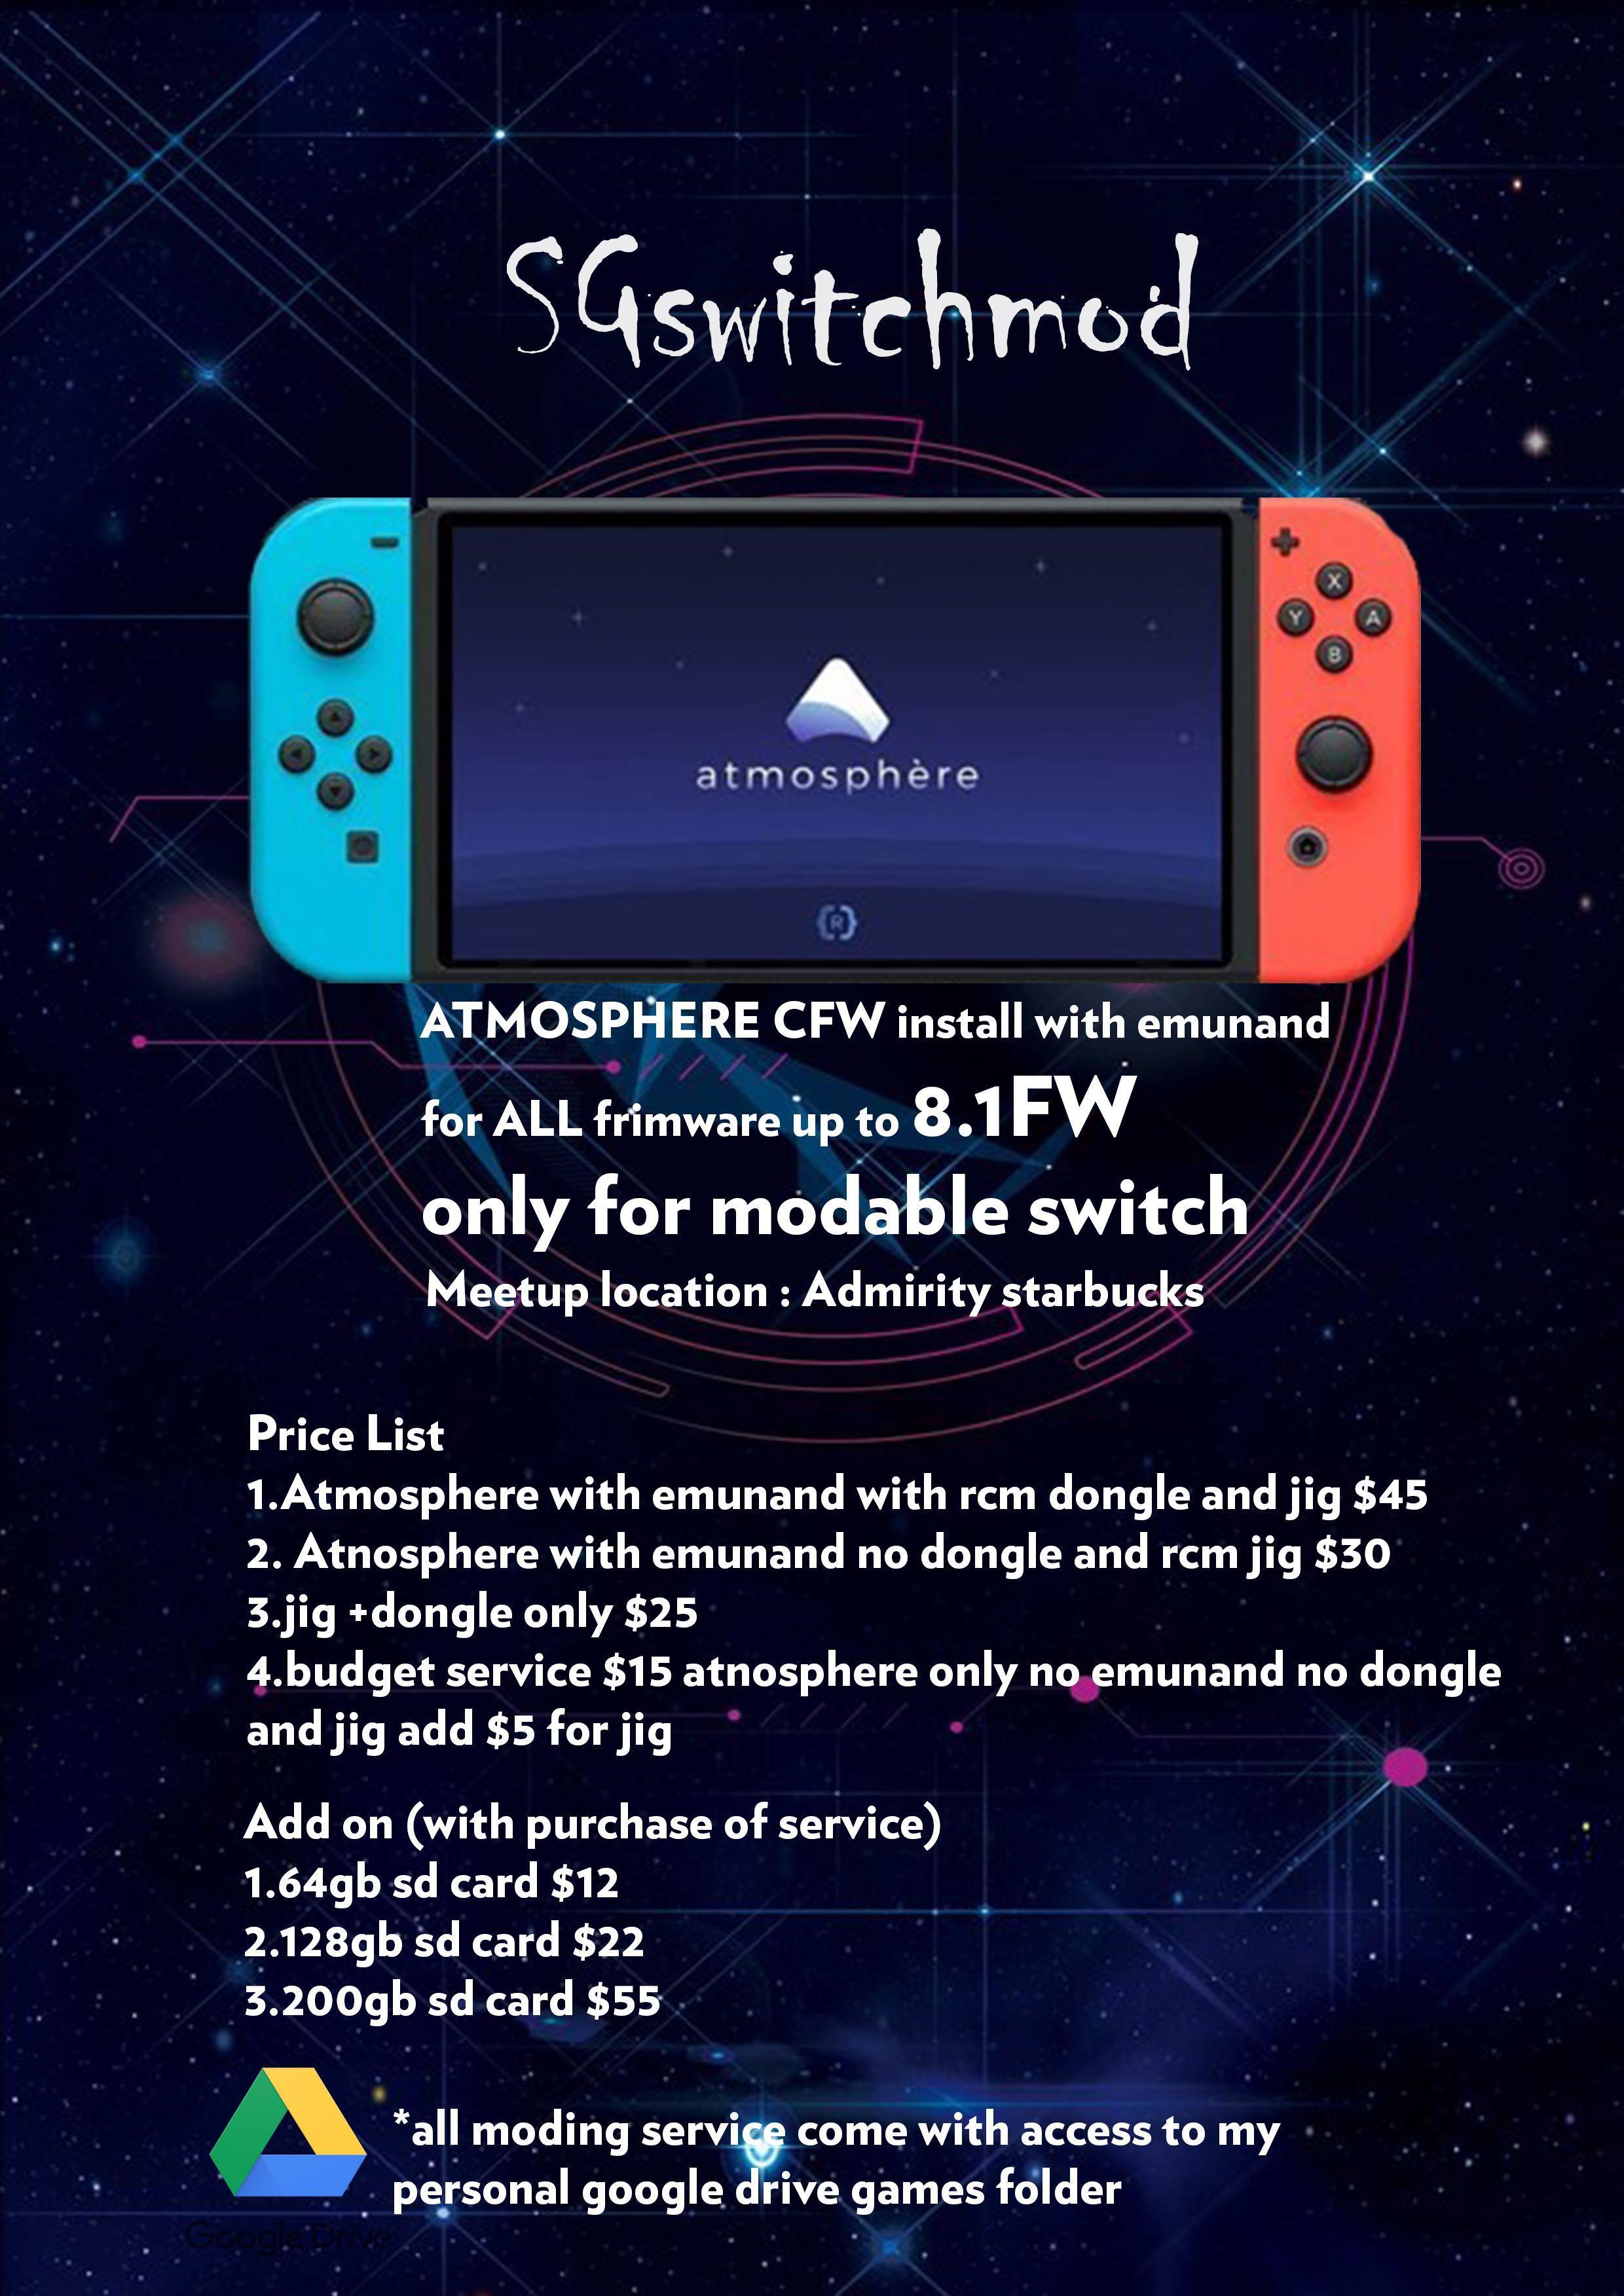 Nintendo Switch mod/modding , Toys & Games, Video Gaming